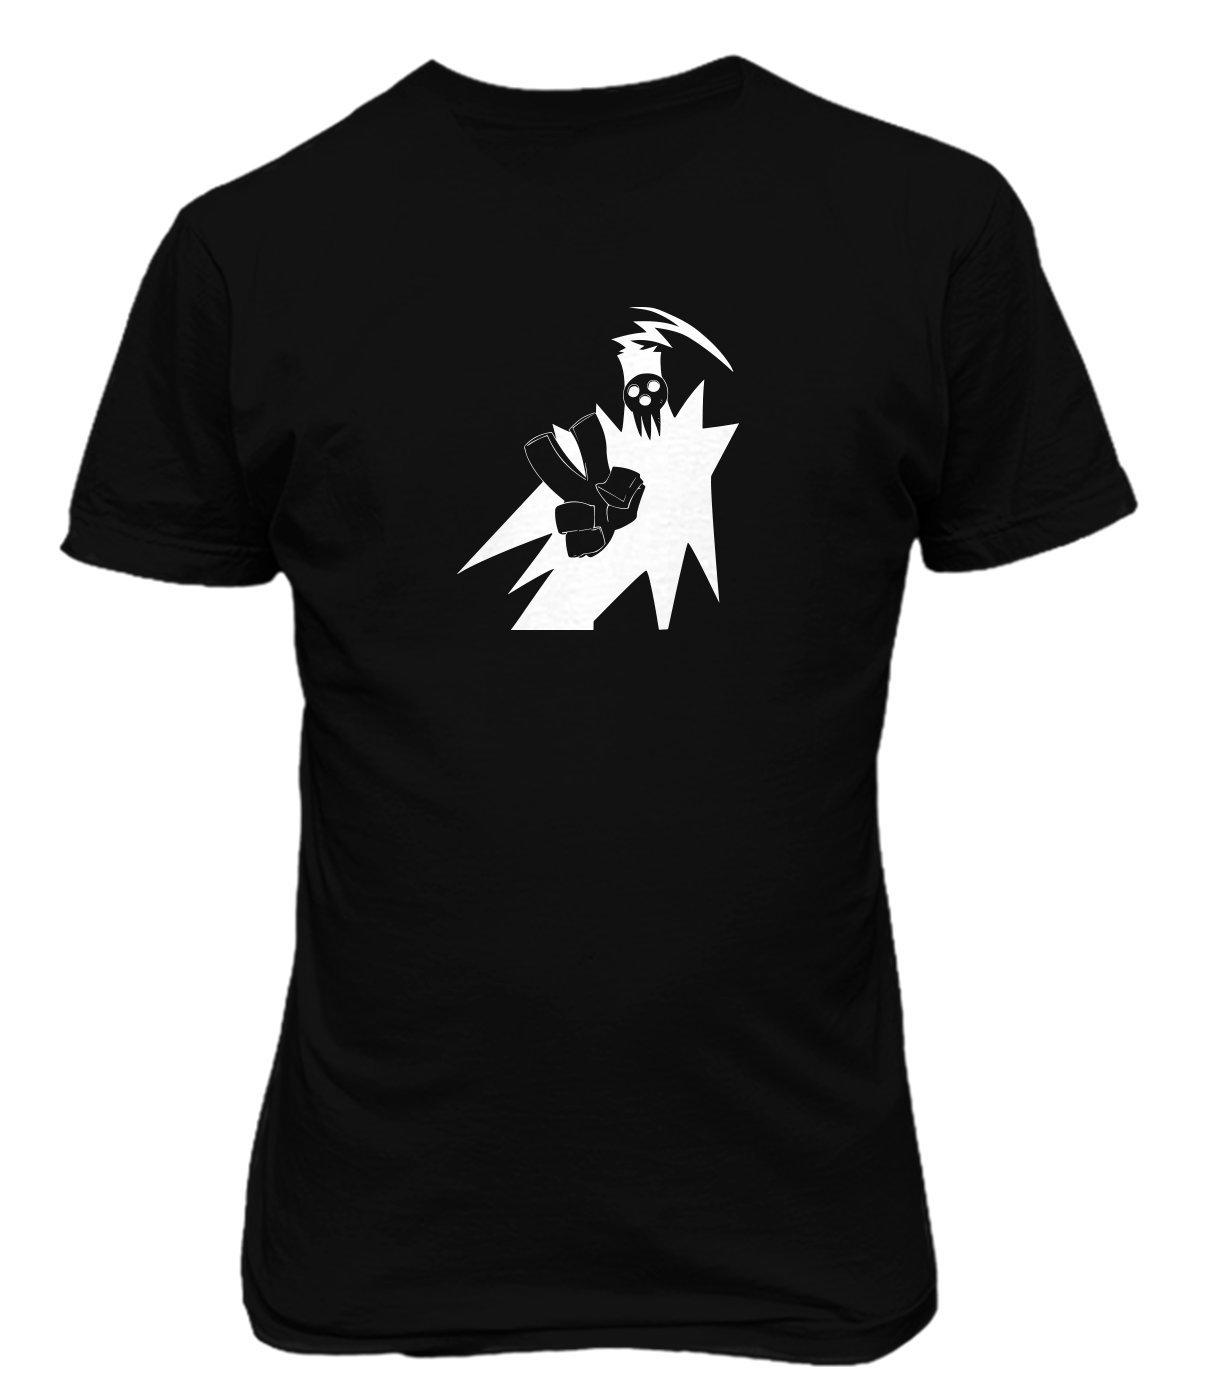 Shinigami Sama Lord Death Soul Eater Manga Anime T Shirt 5